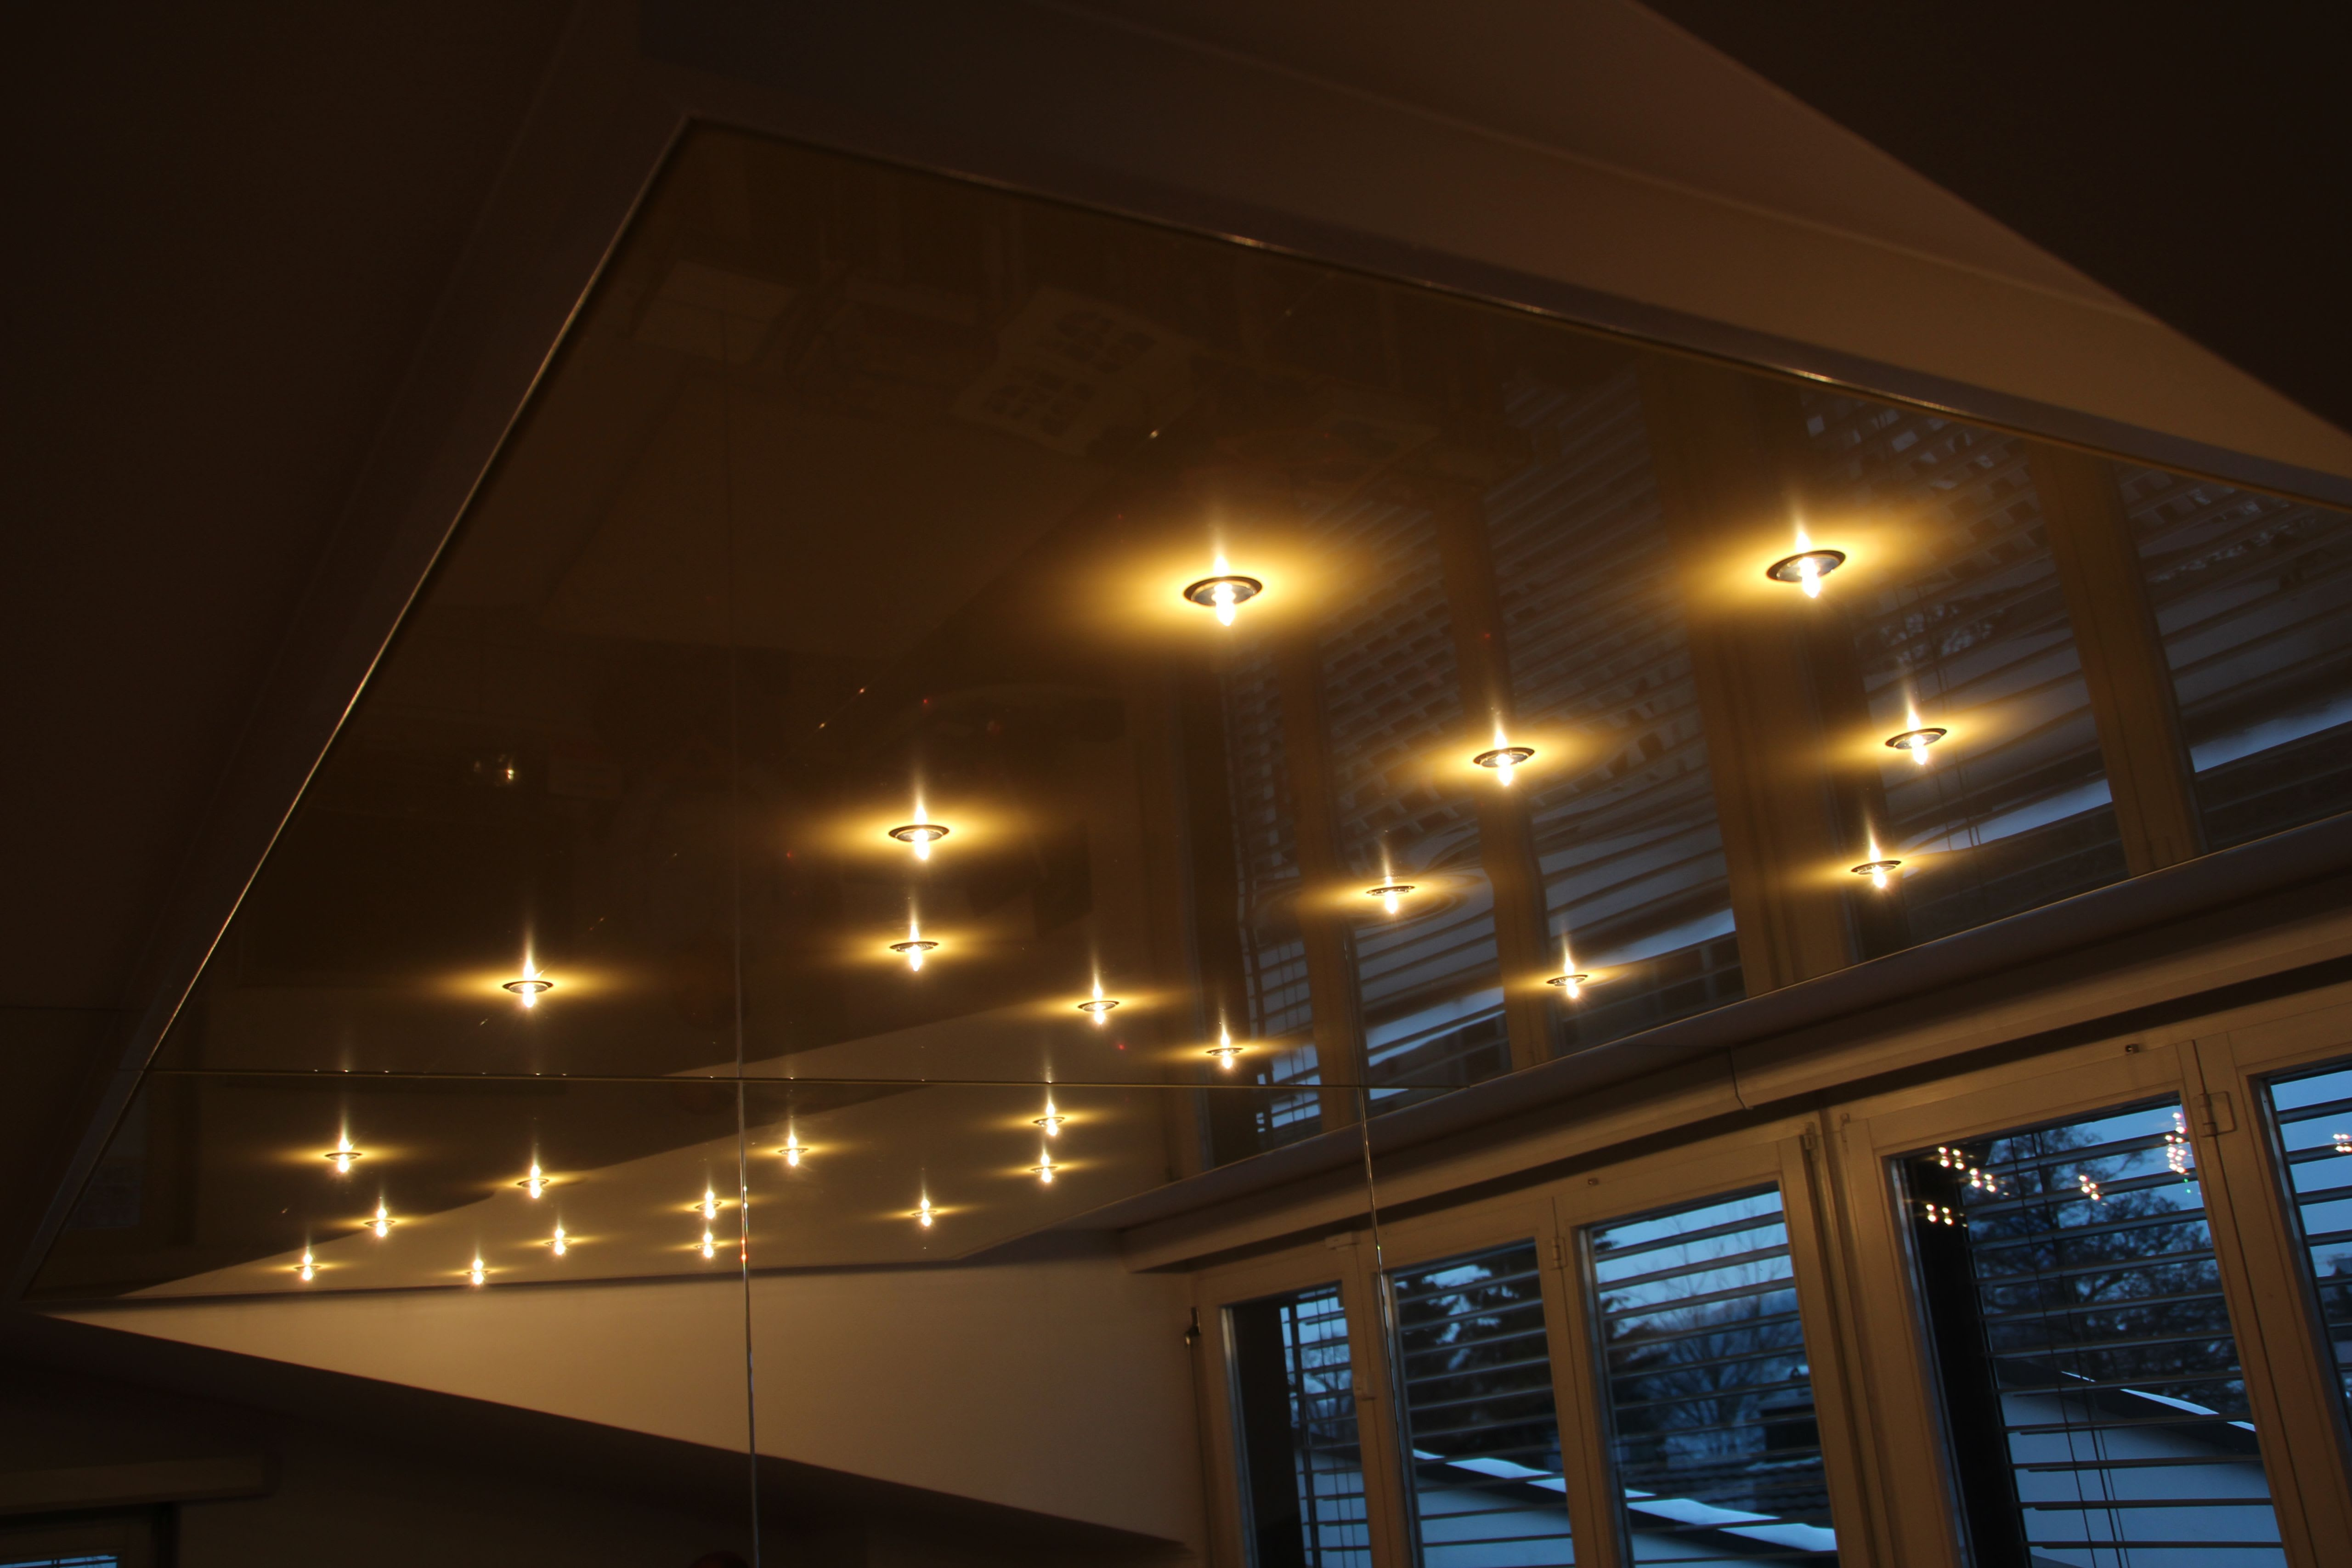 Galerie Schlafzimmer CILING Spanndecke Sternenhimmel Beleuchtung